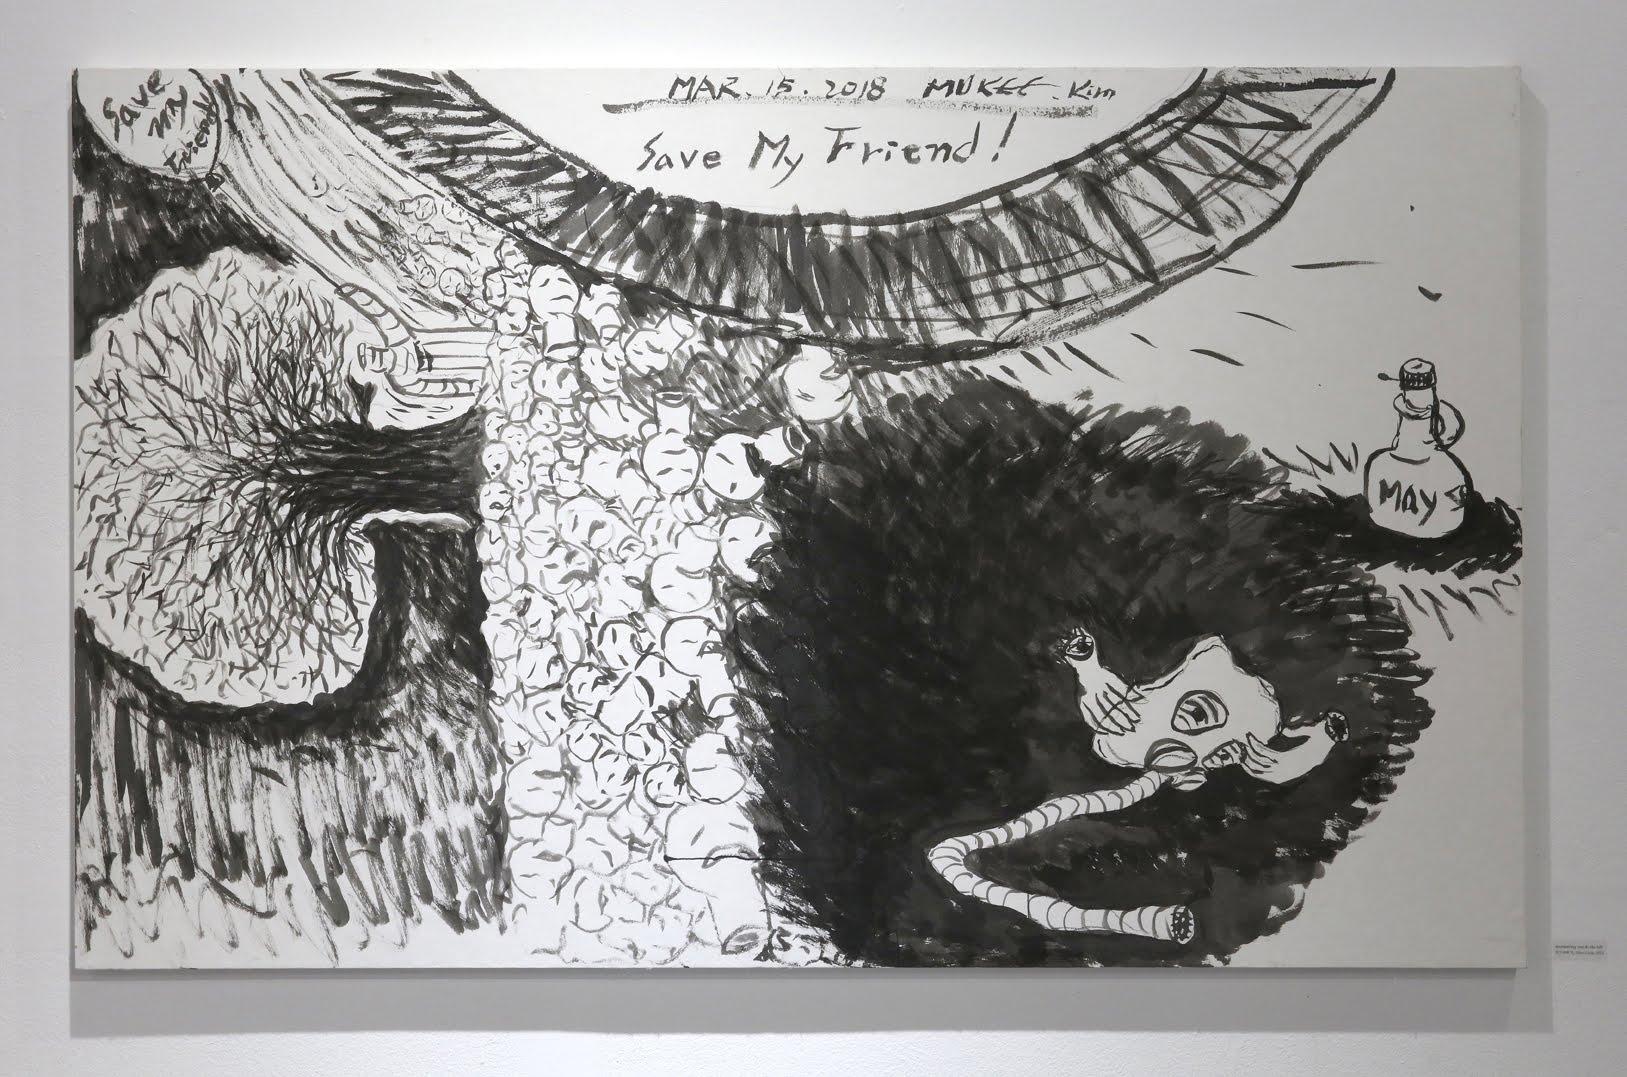 Mu Kee Kim Solo Exhibition: Save My Friend!